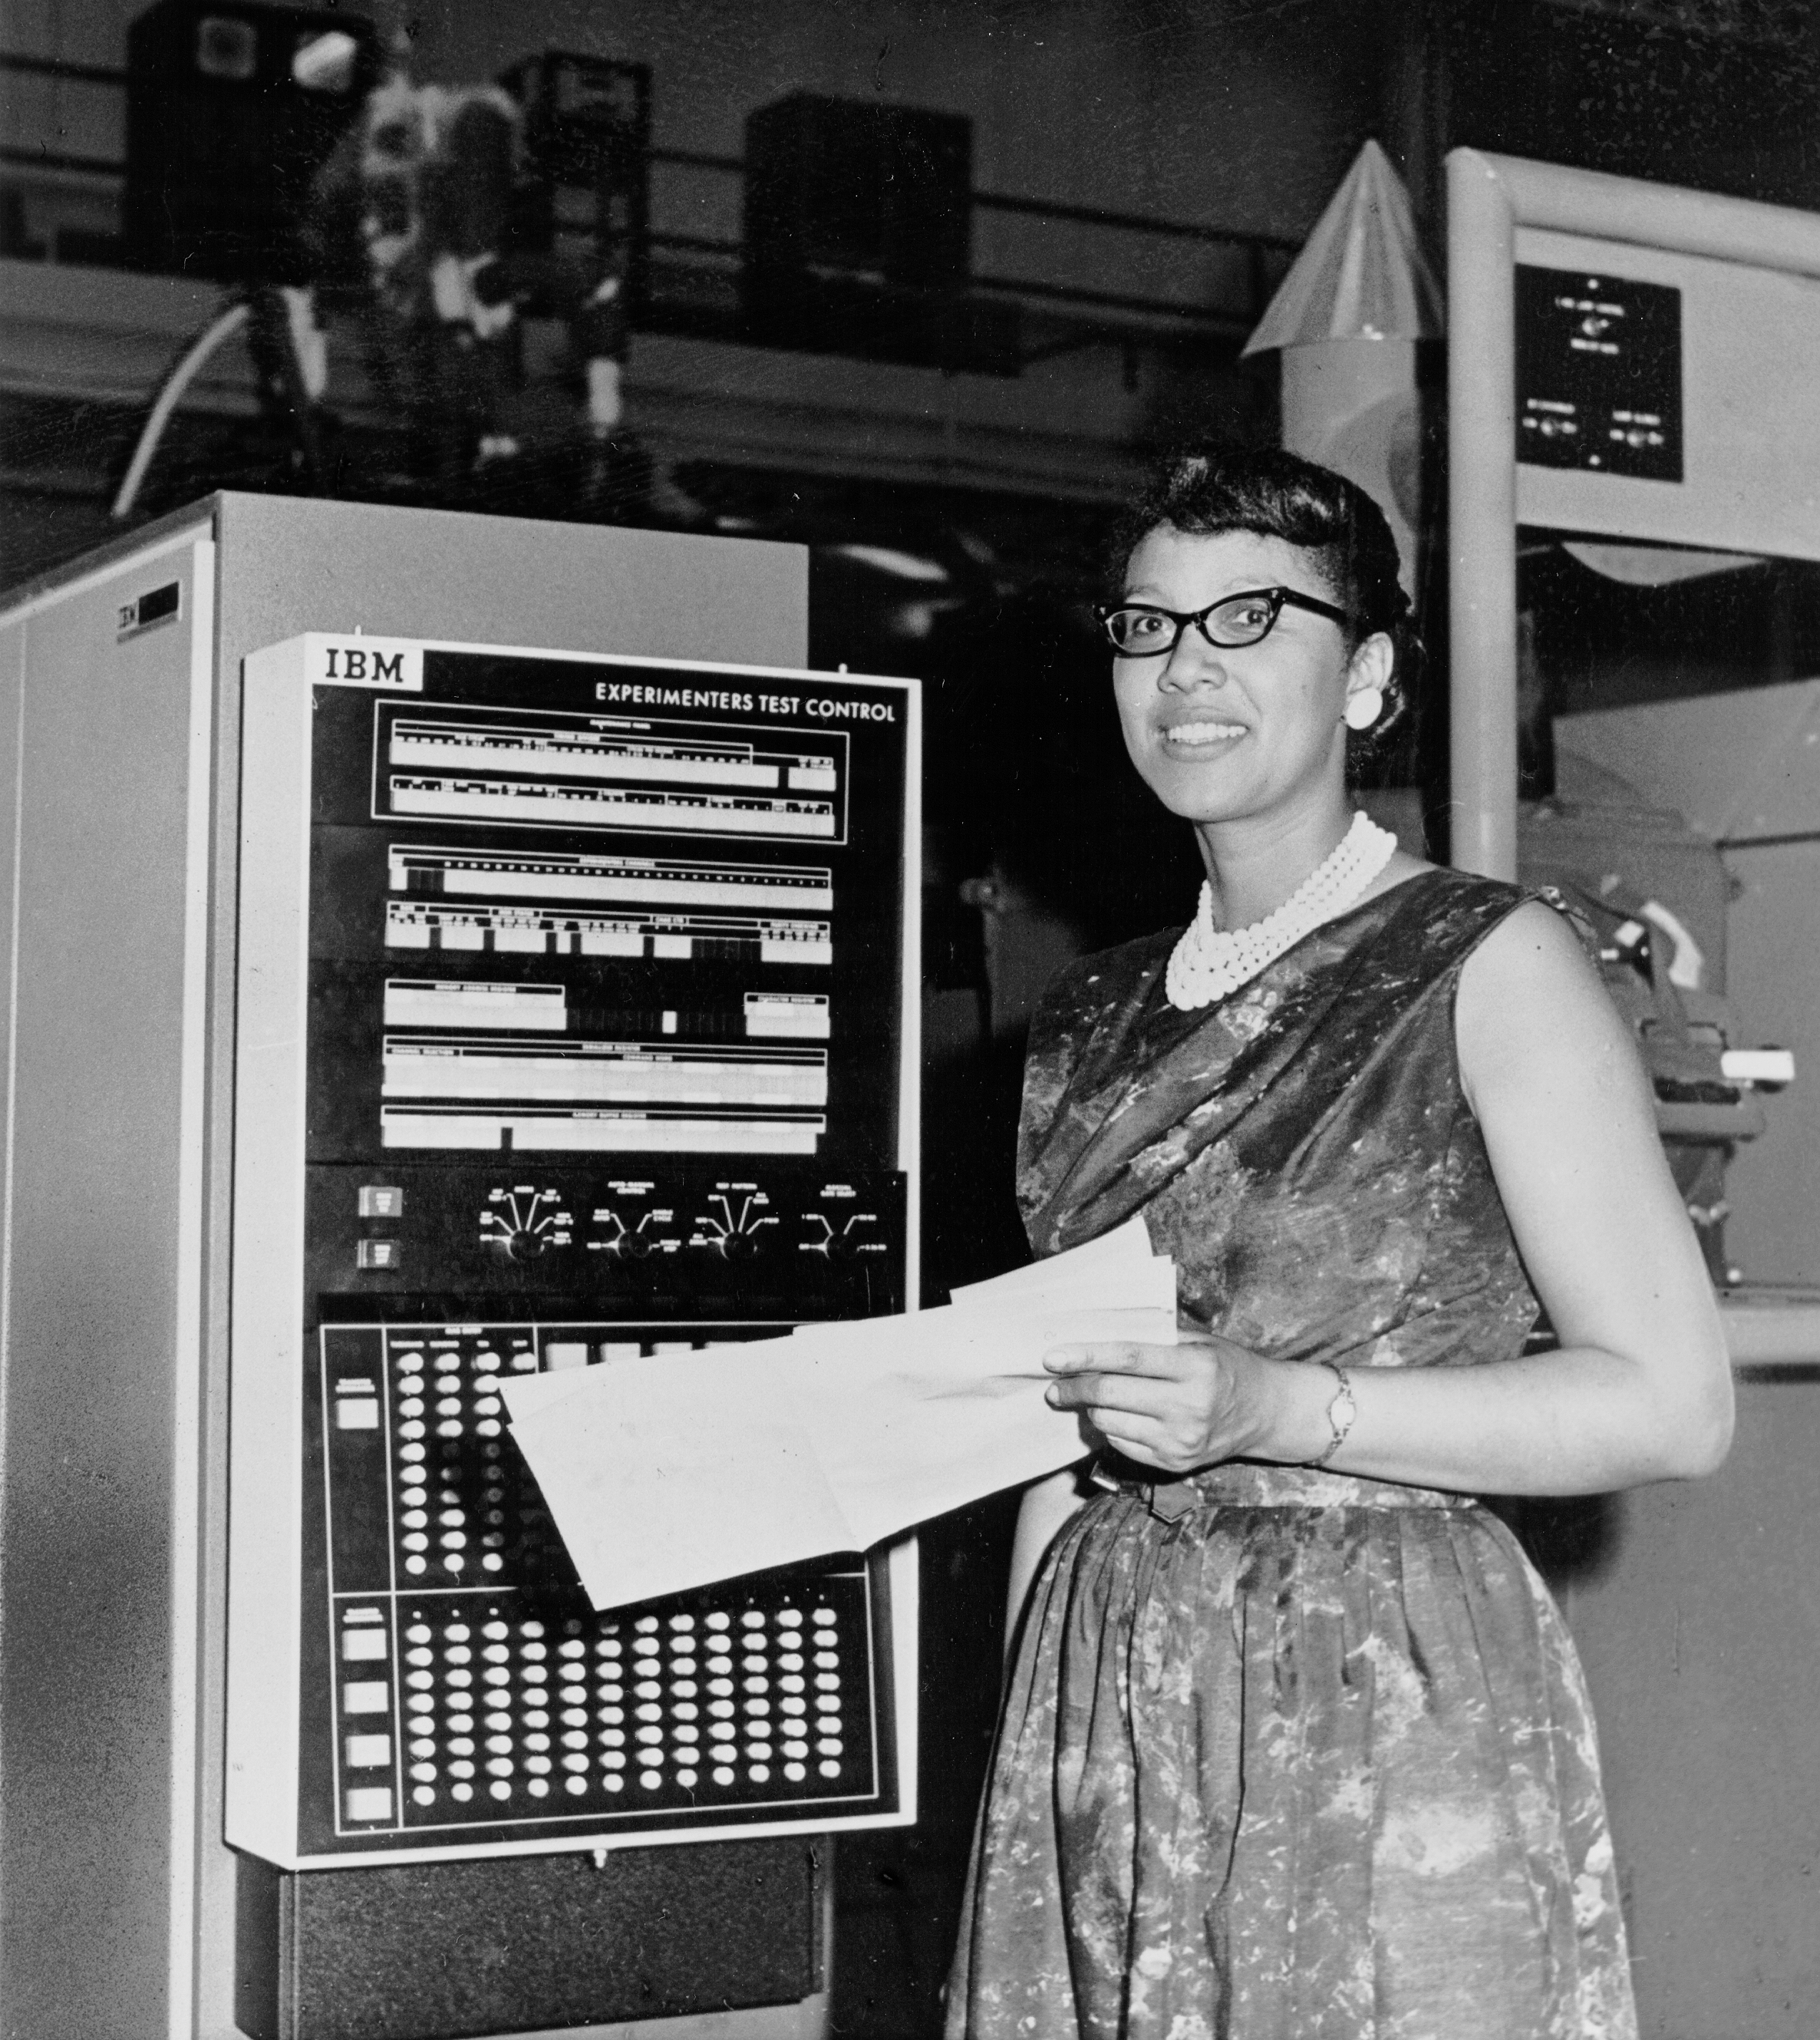 Melba_Roy_-_Female_Computer_-_GPN-2000-001647.jpg